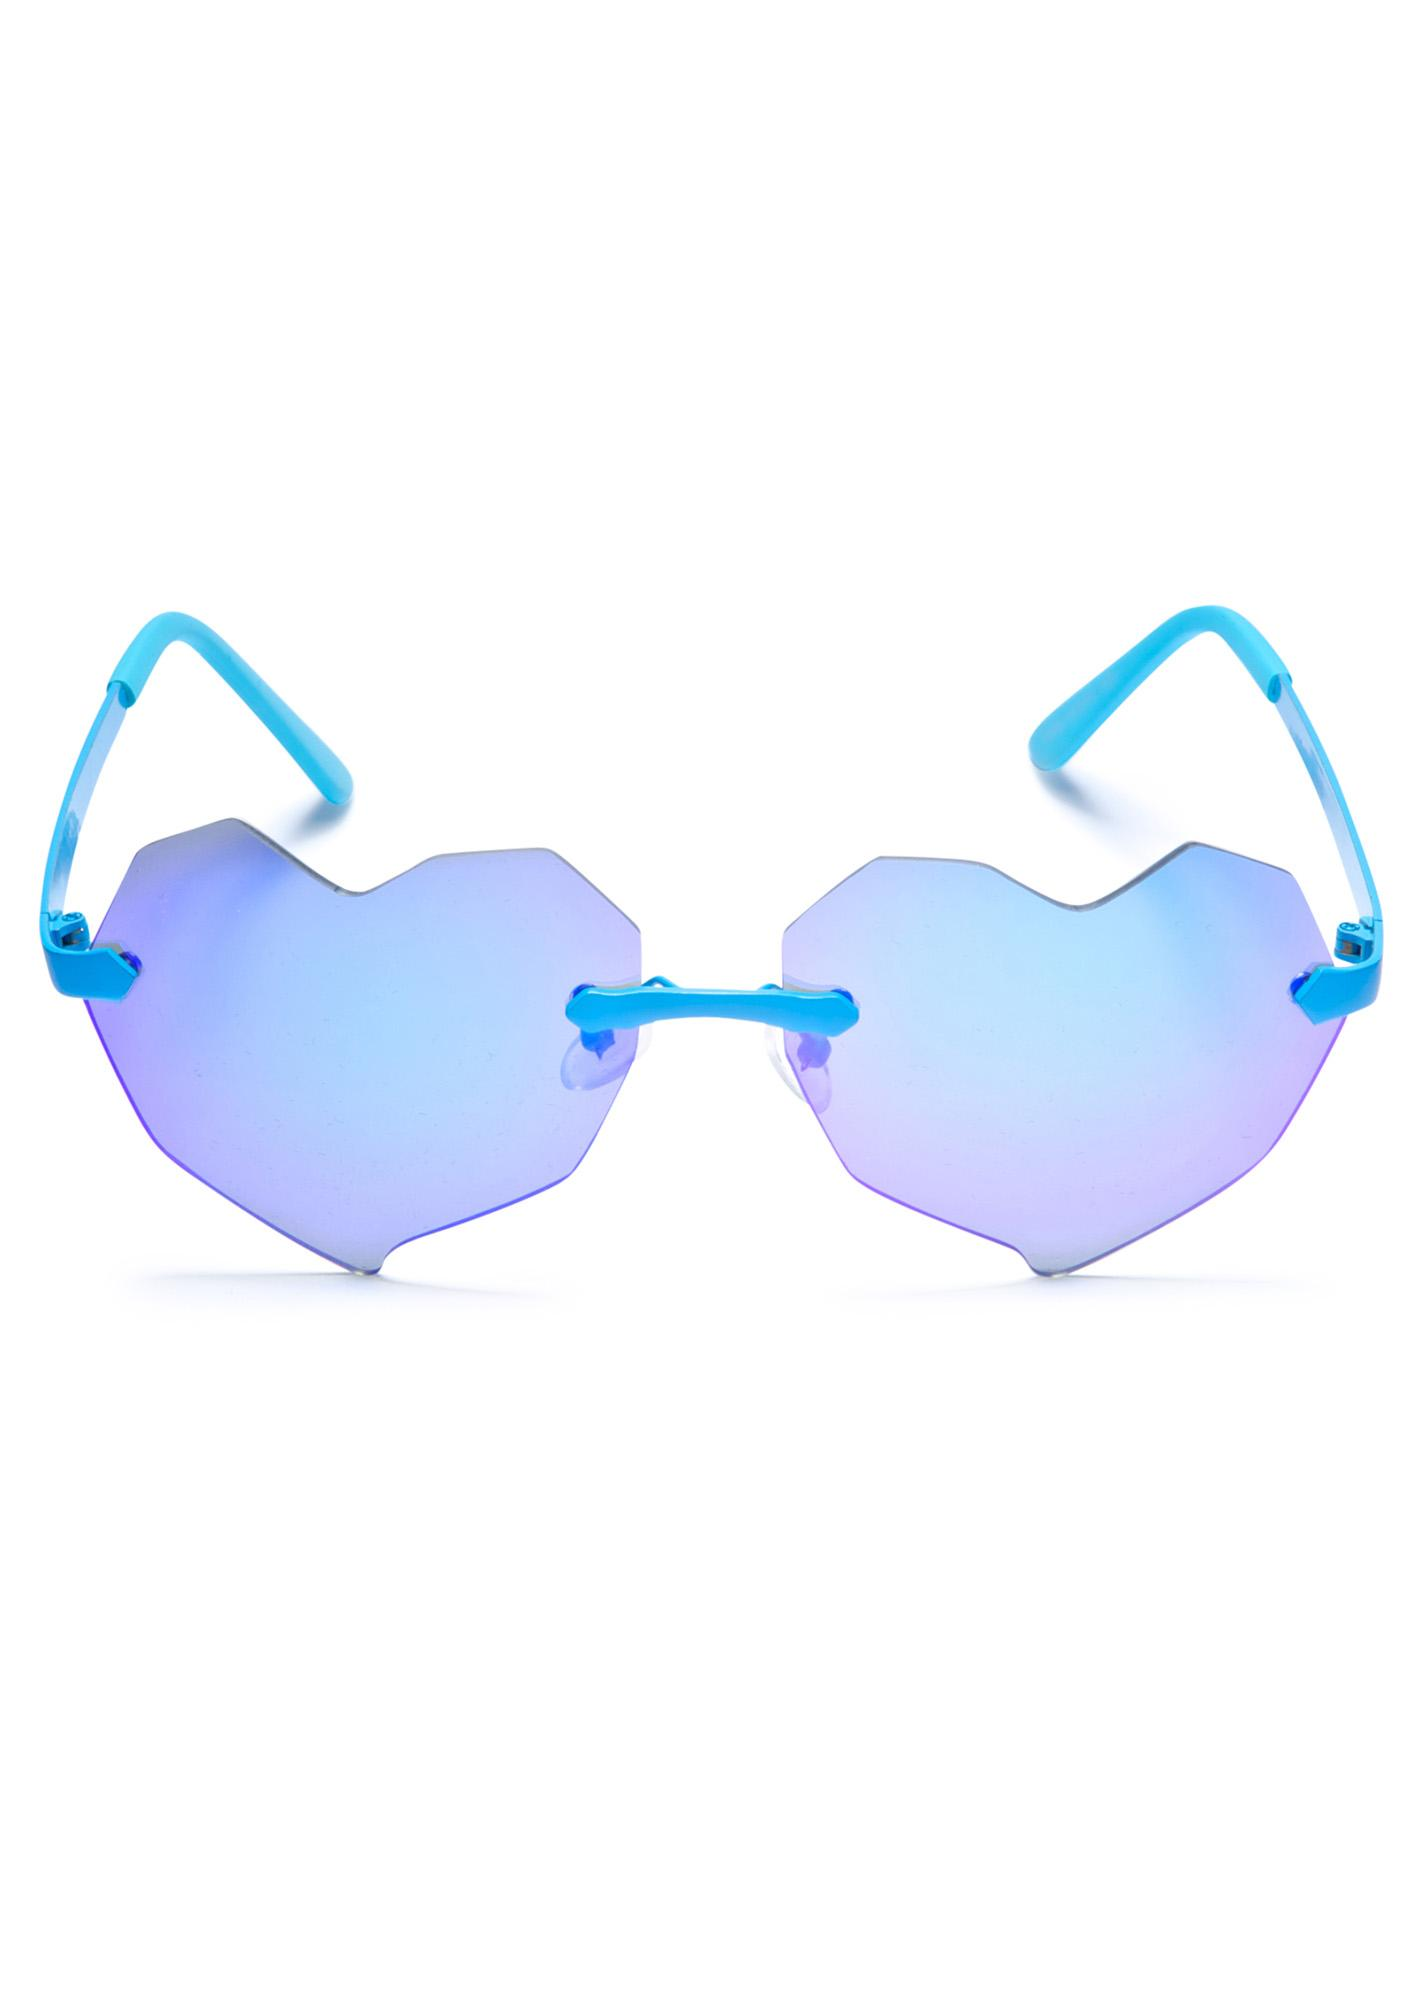 ESQAPE Lovelii Blue Heart Sunglasses